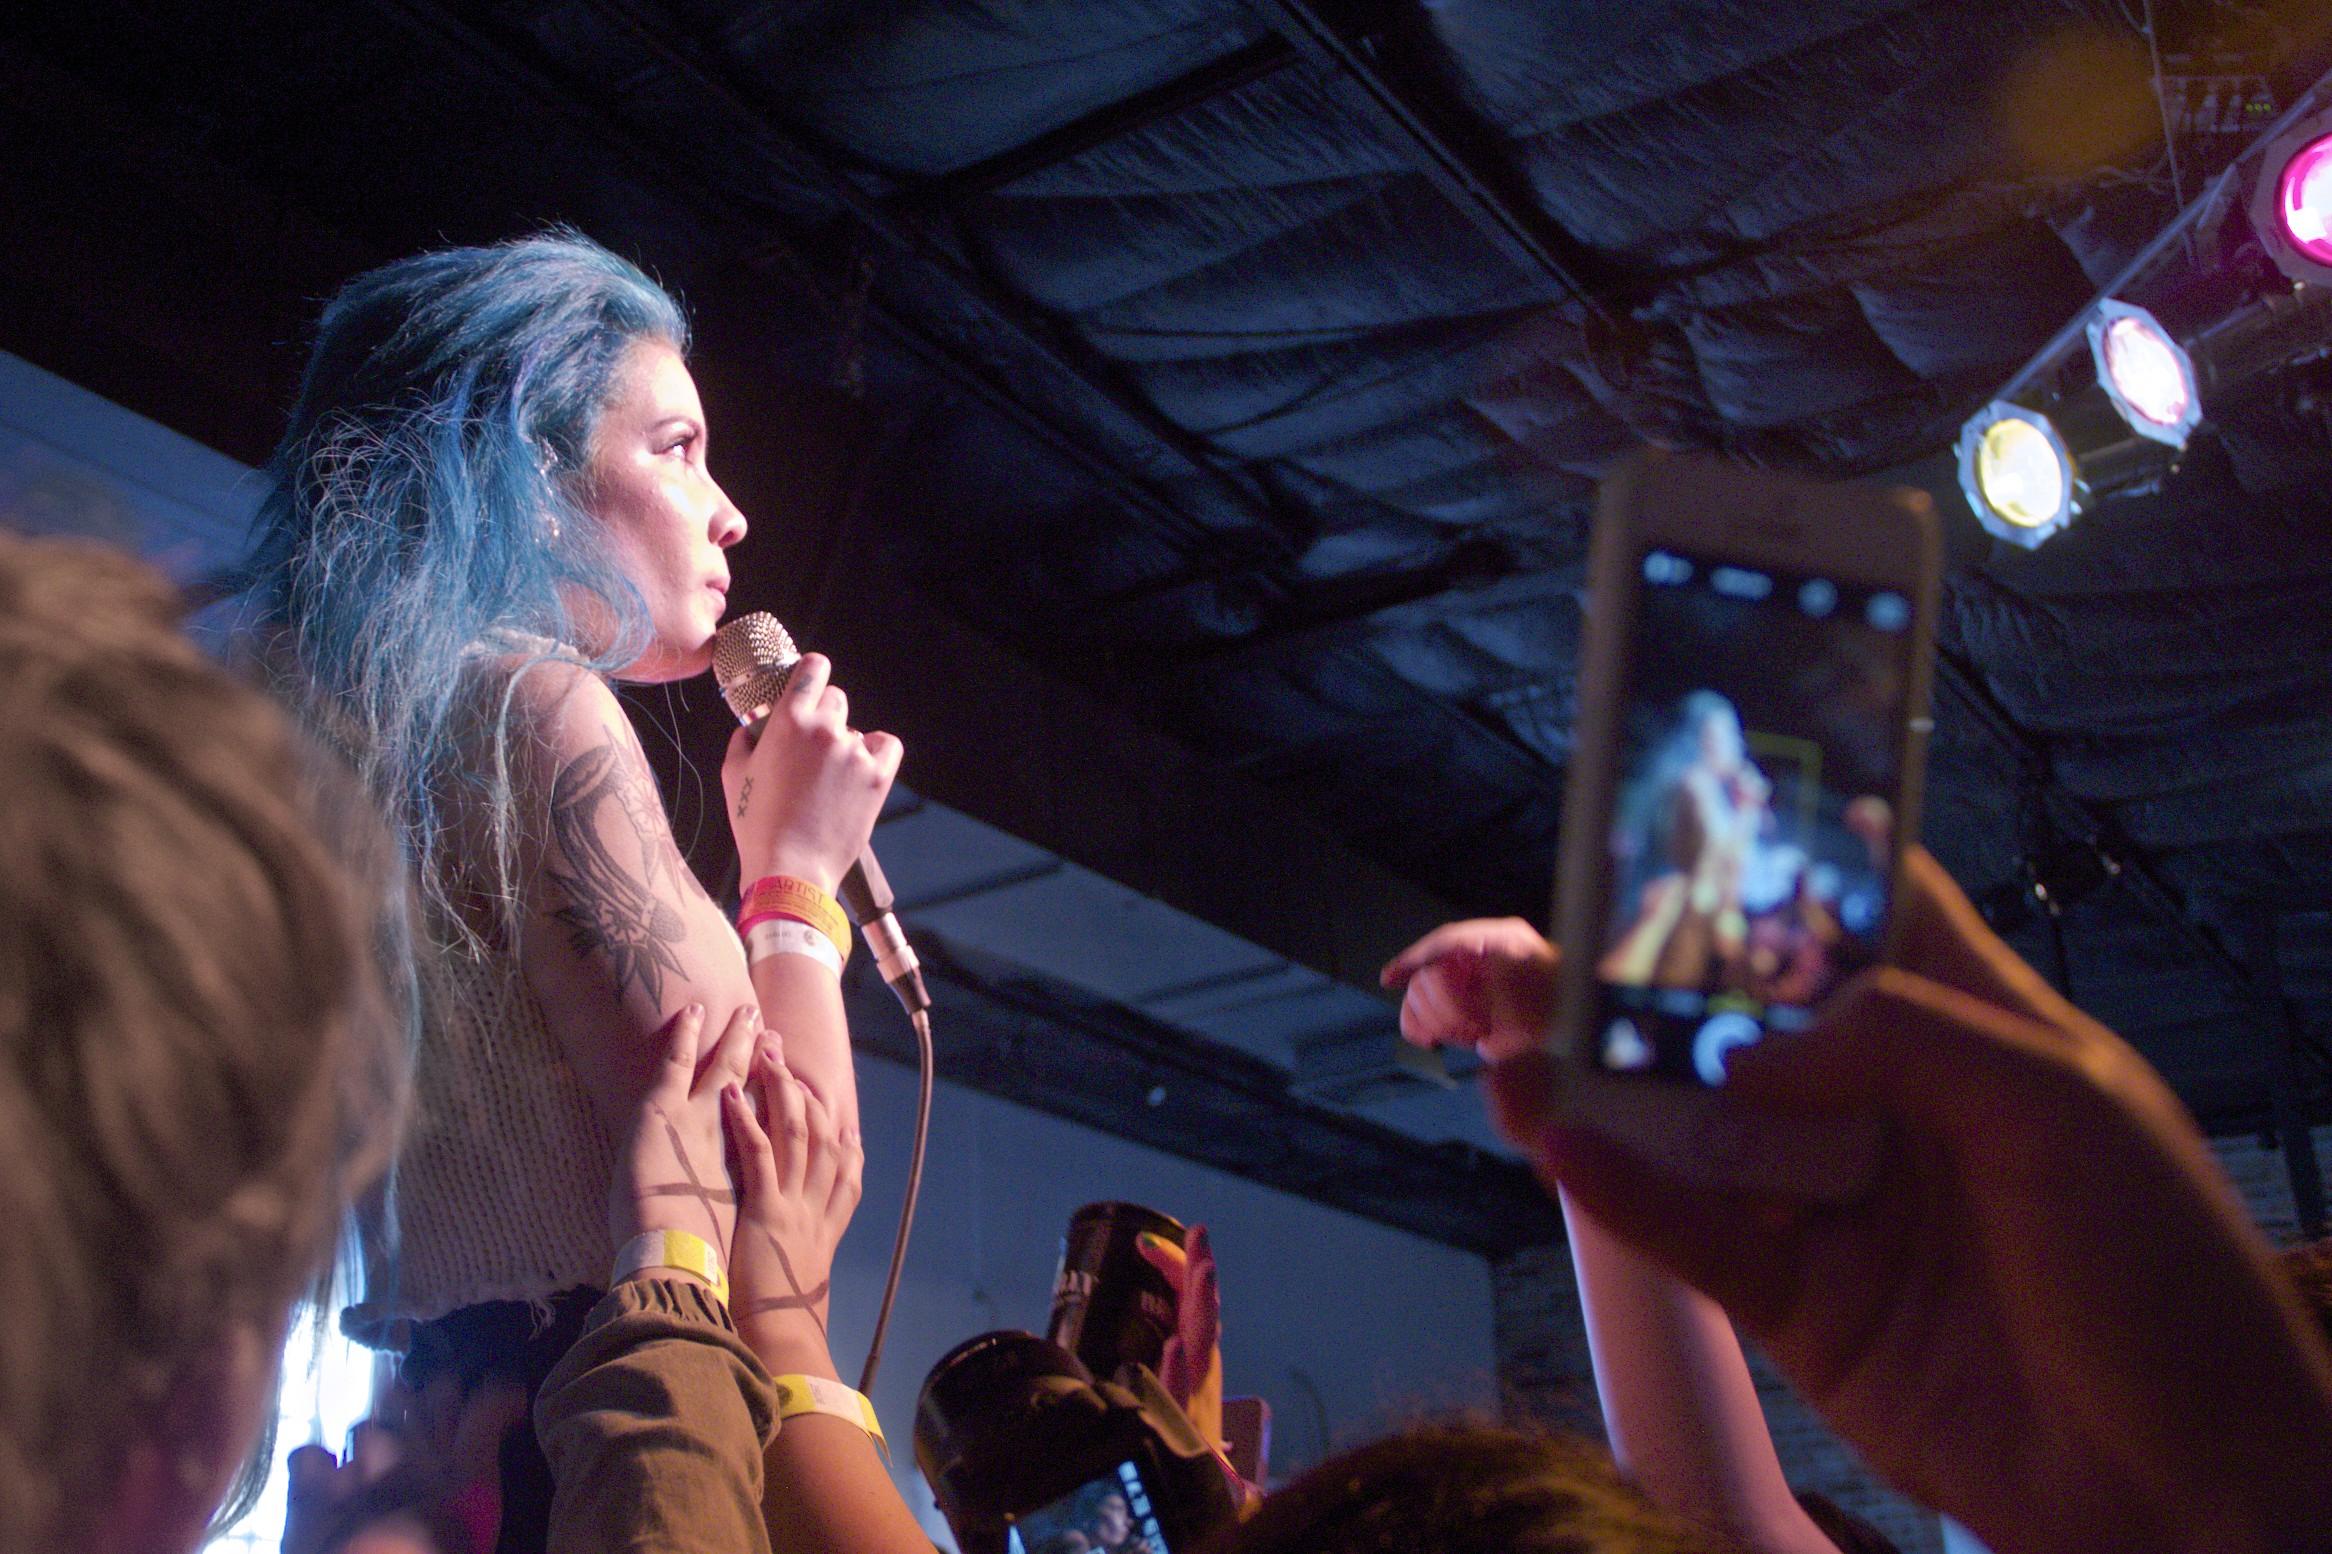 Halsey at SXSW 2015 in Austin, TX (photo credit: Maddie Casey/Ultra5280)